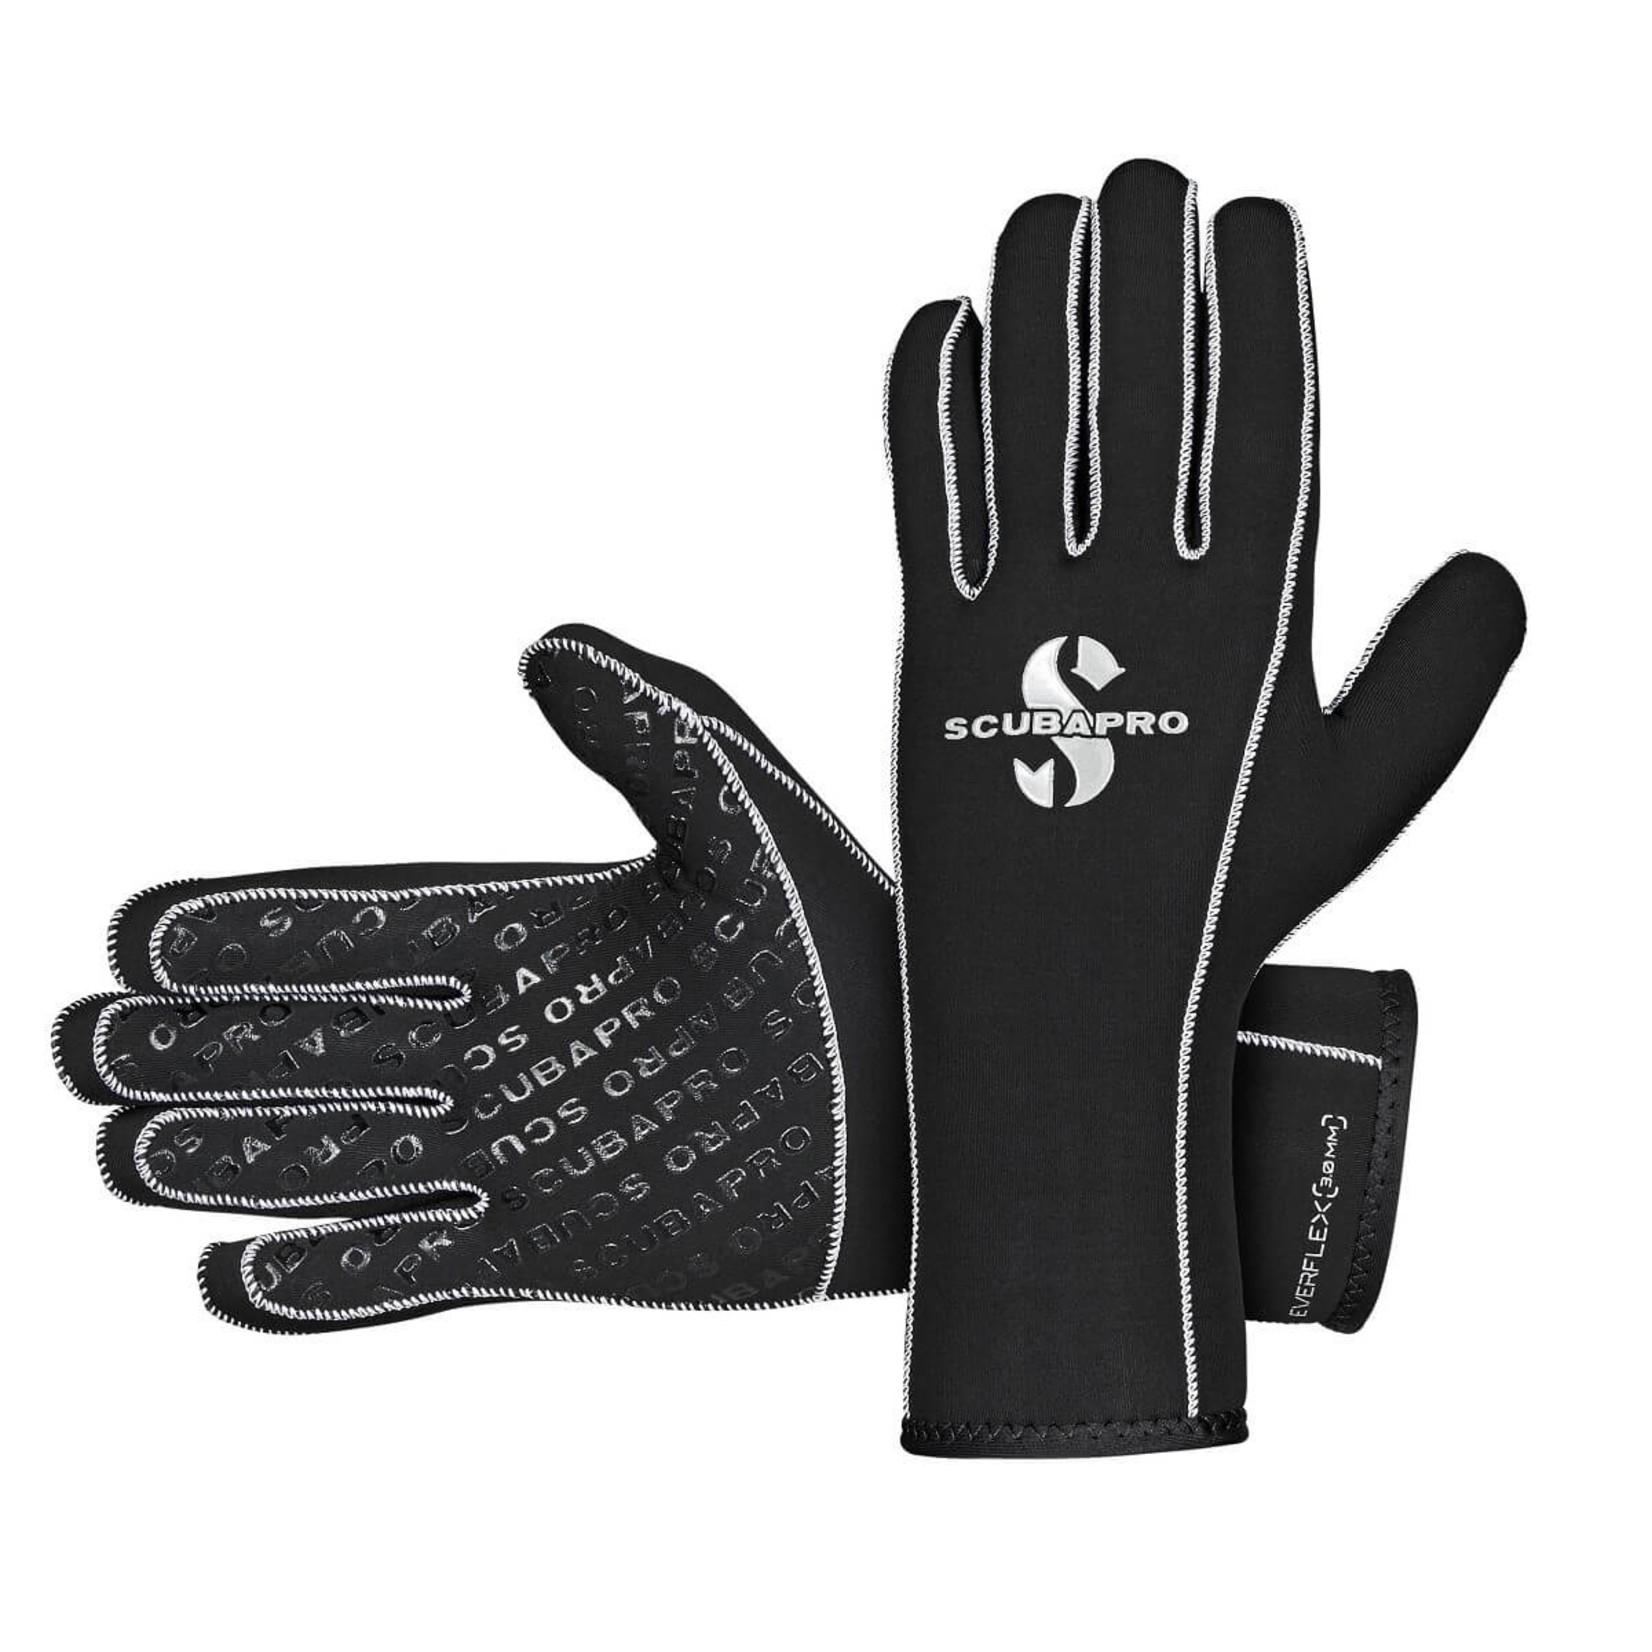 Scubapro EVERFLEX Handschoenen 3.0